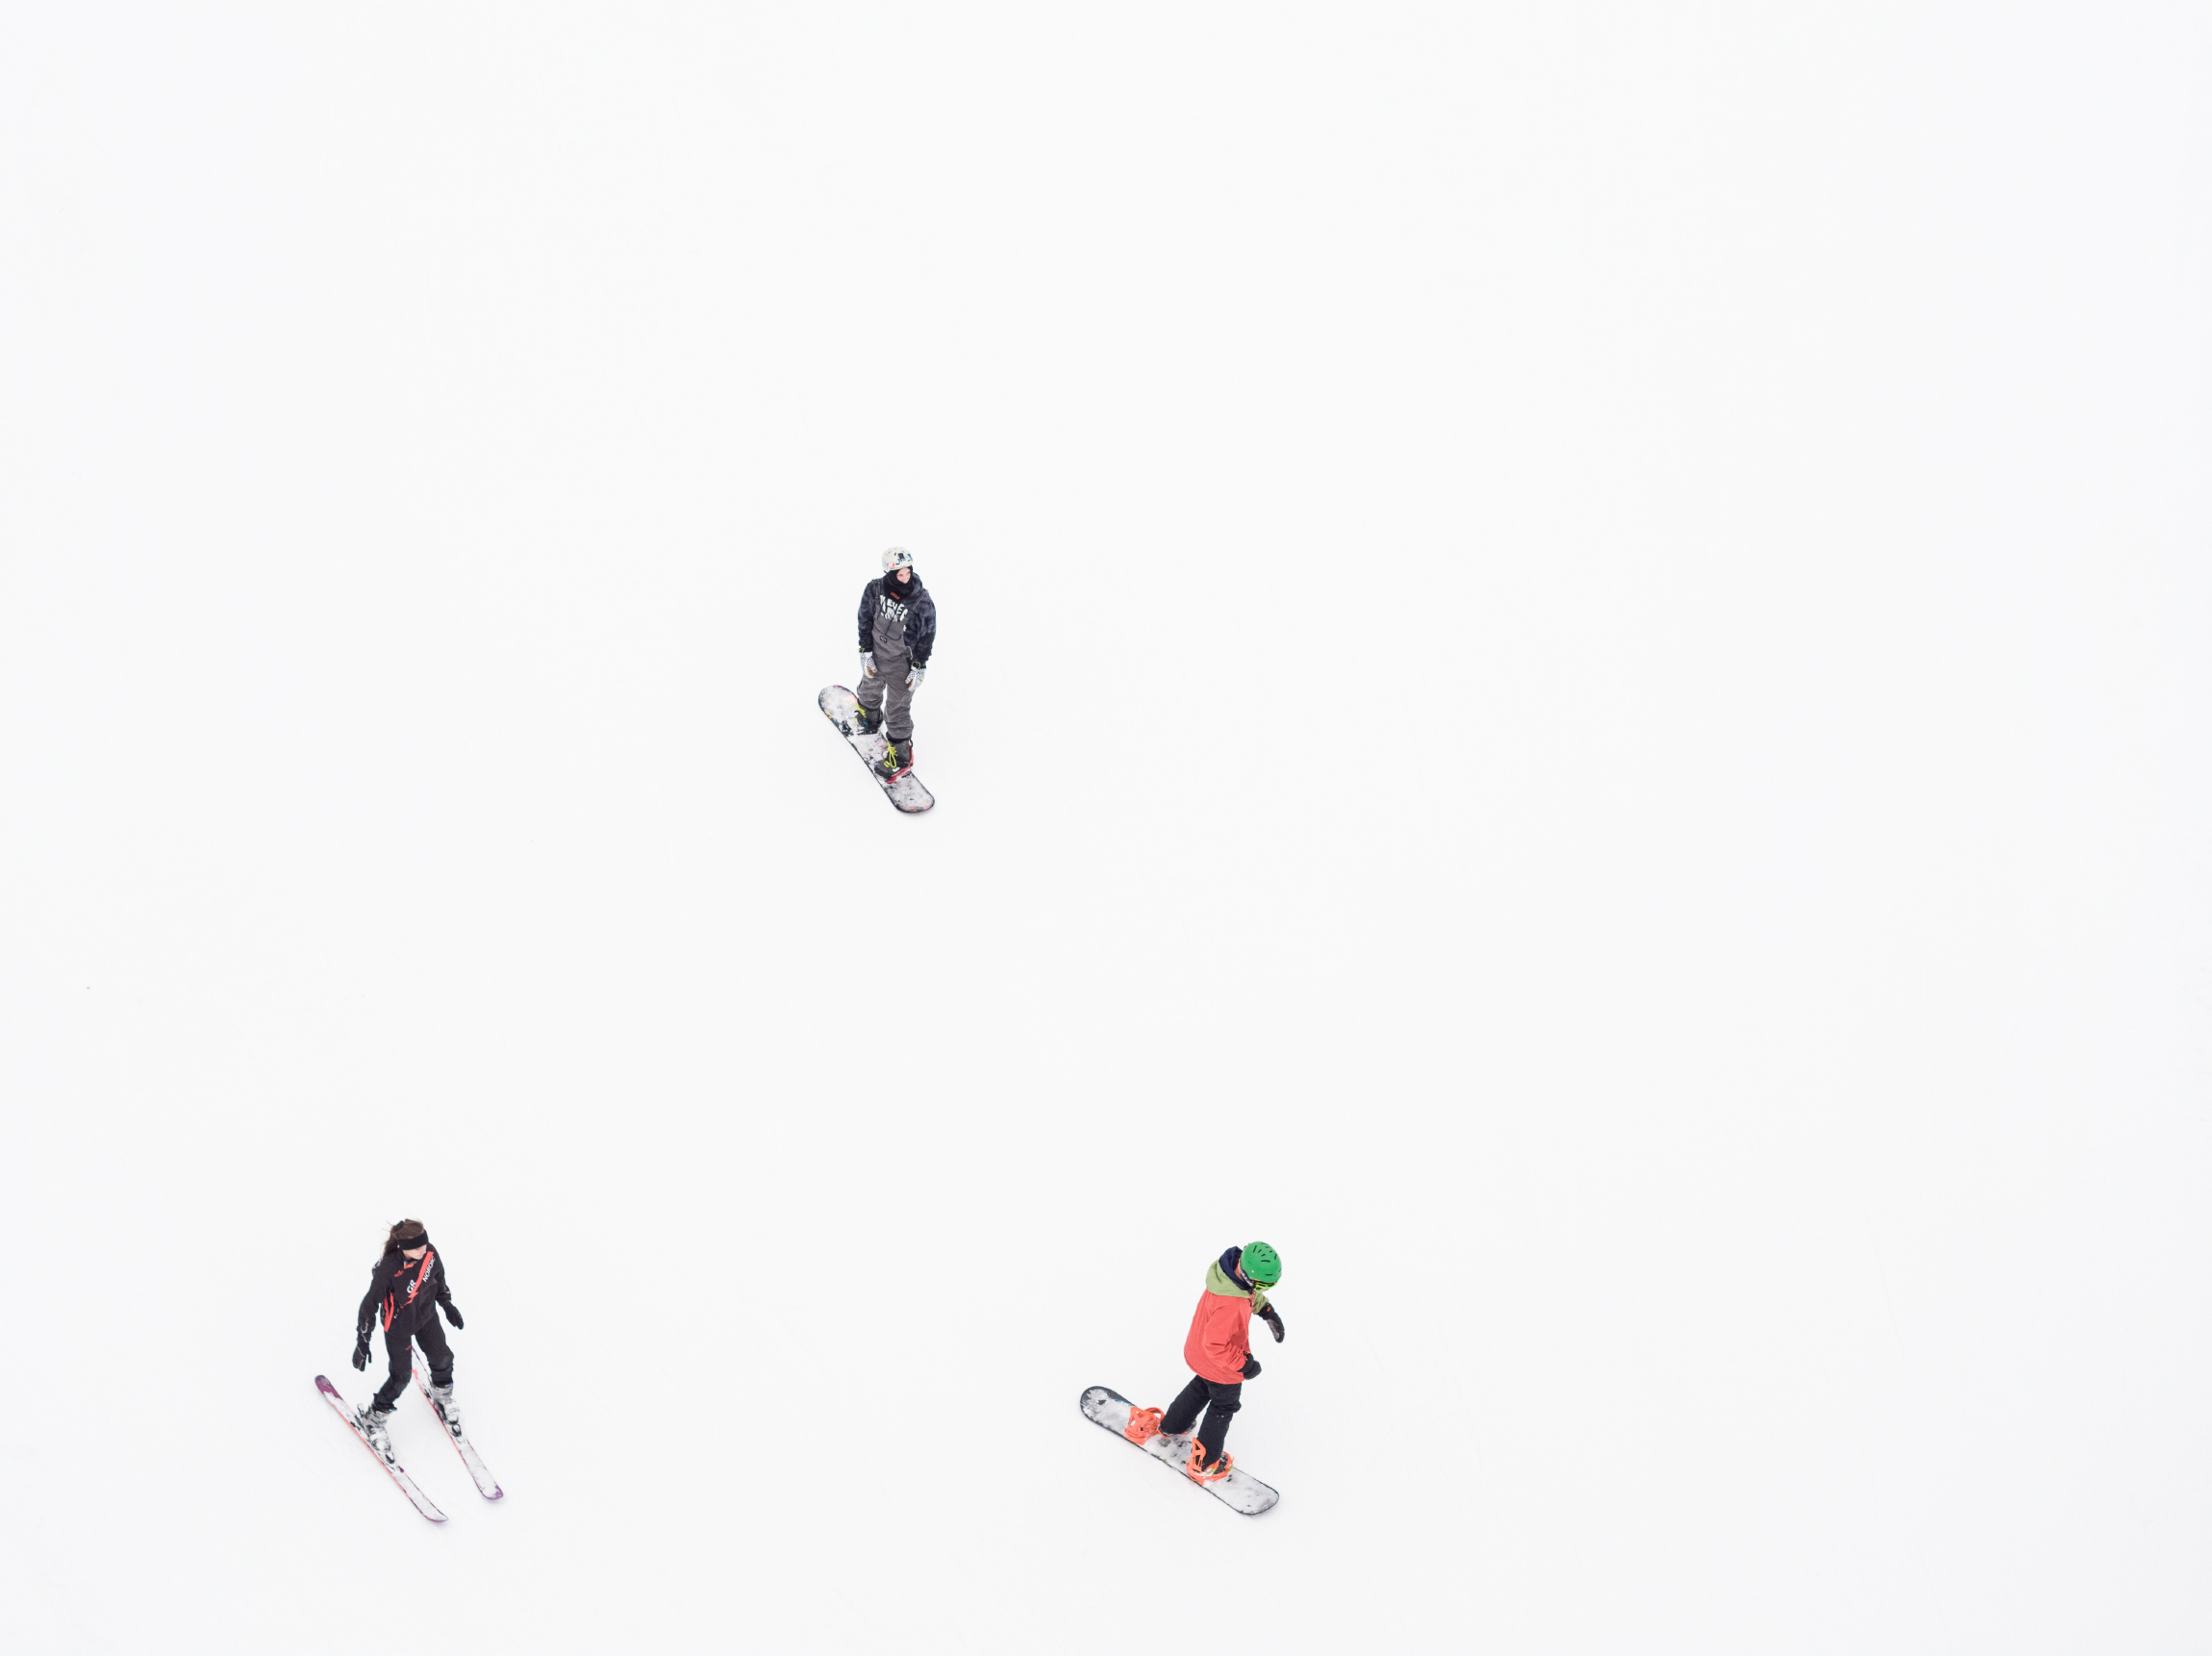 180310_SkiingDrone_0341T.JPG